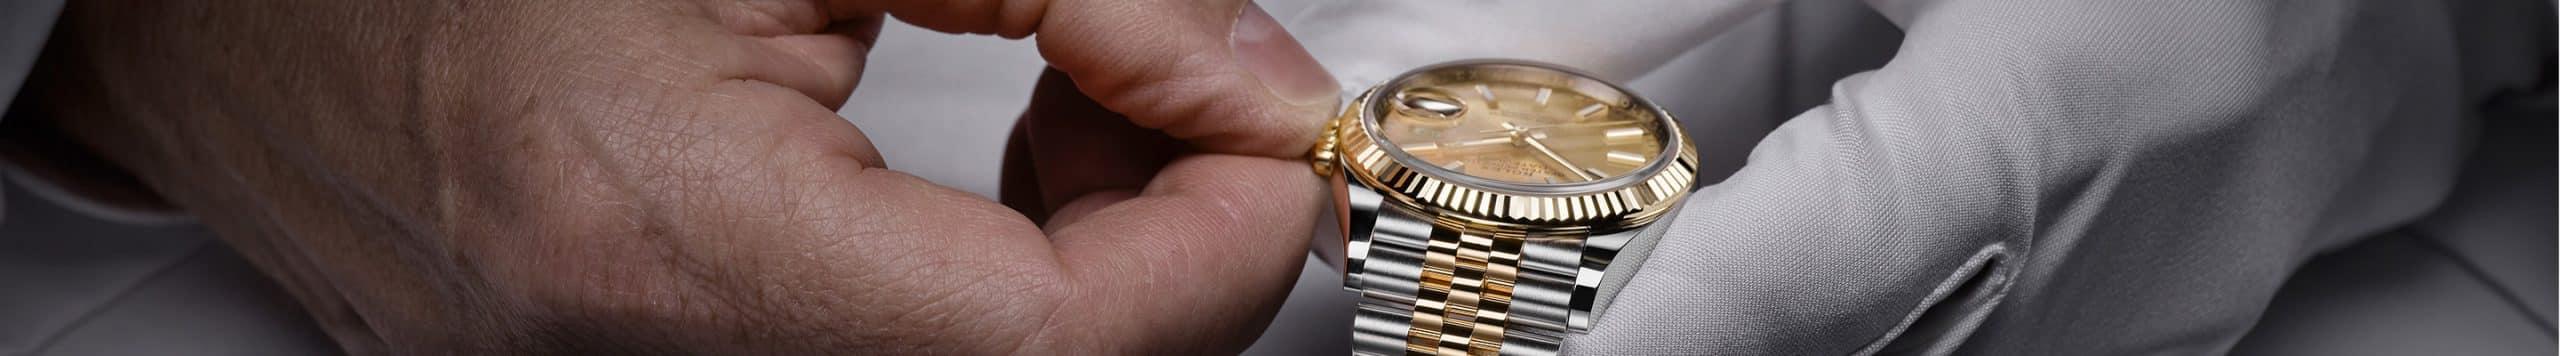 Servicing your Rolex